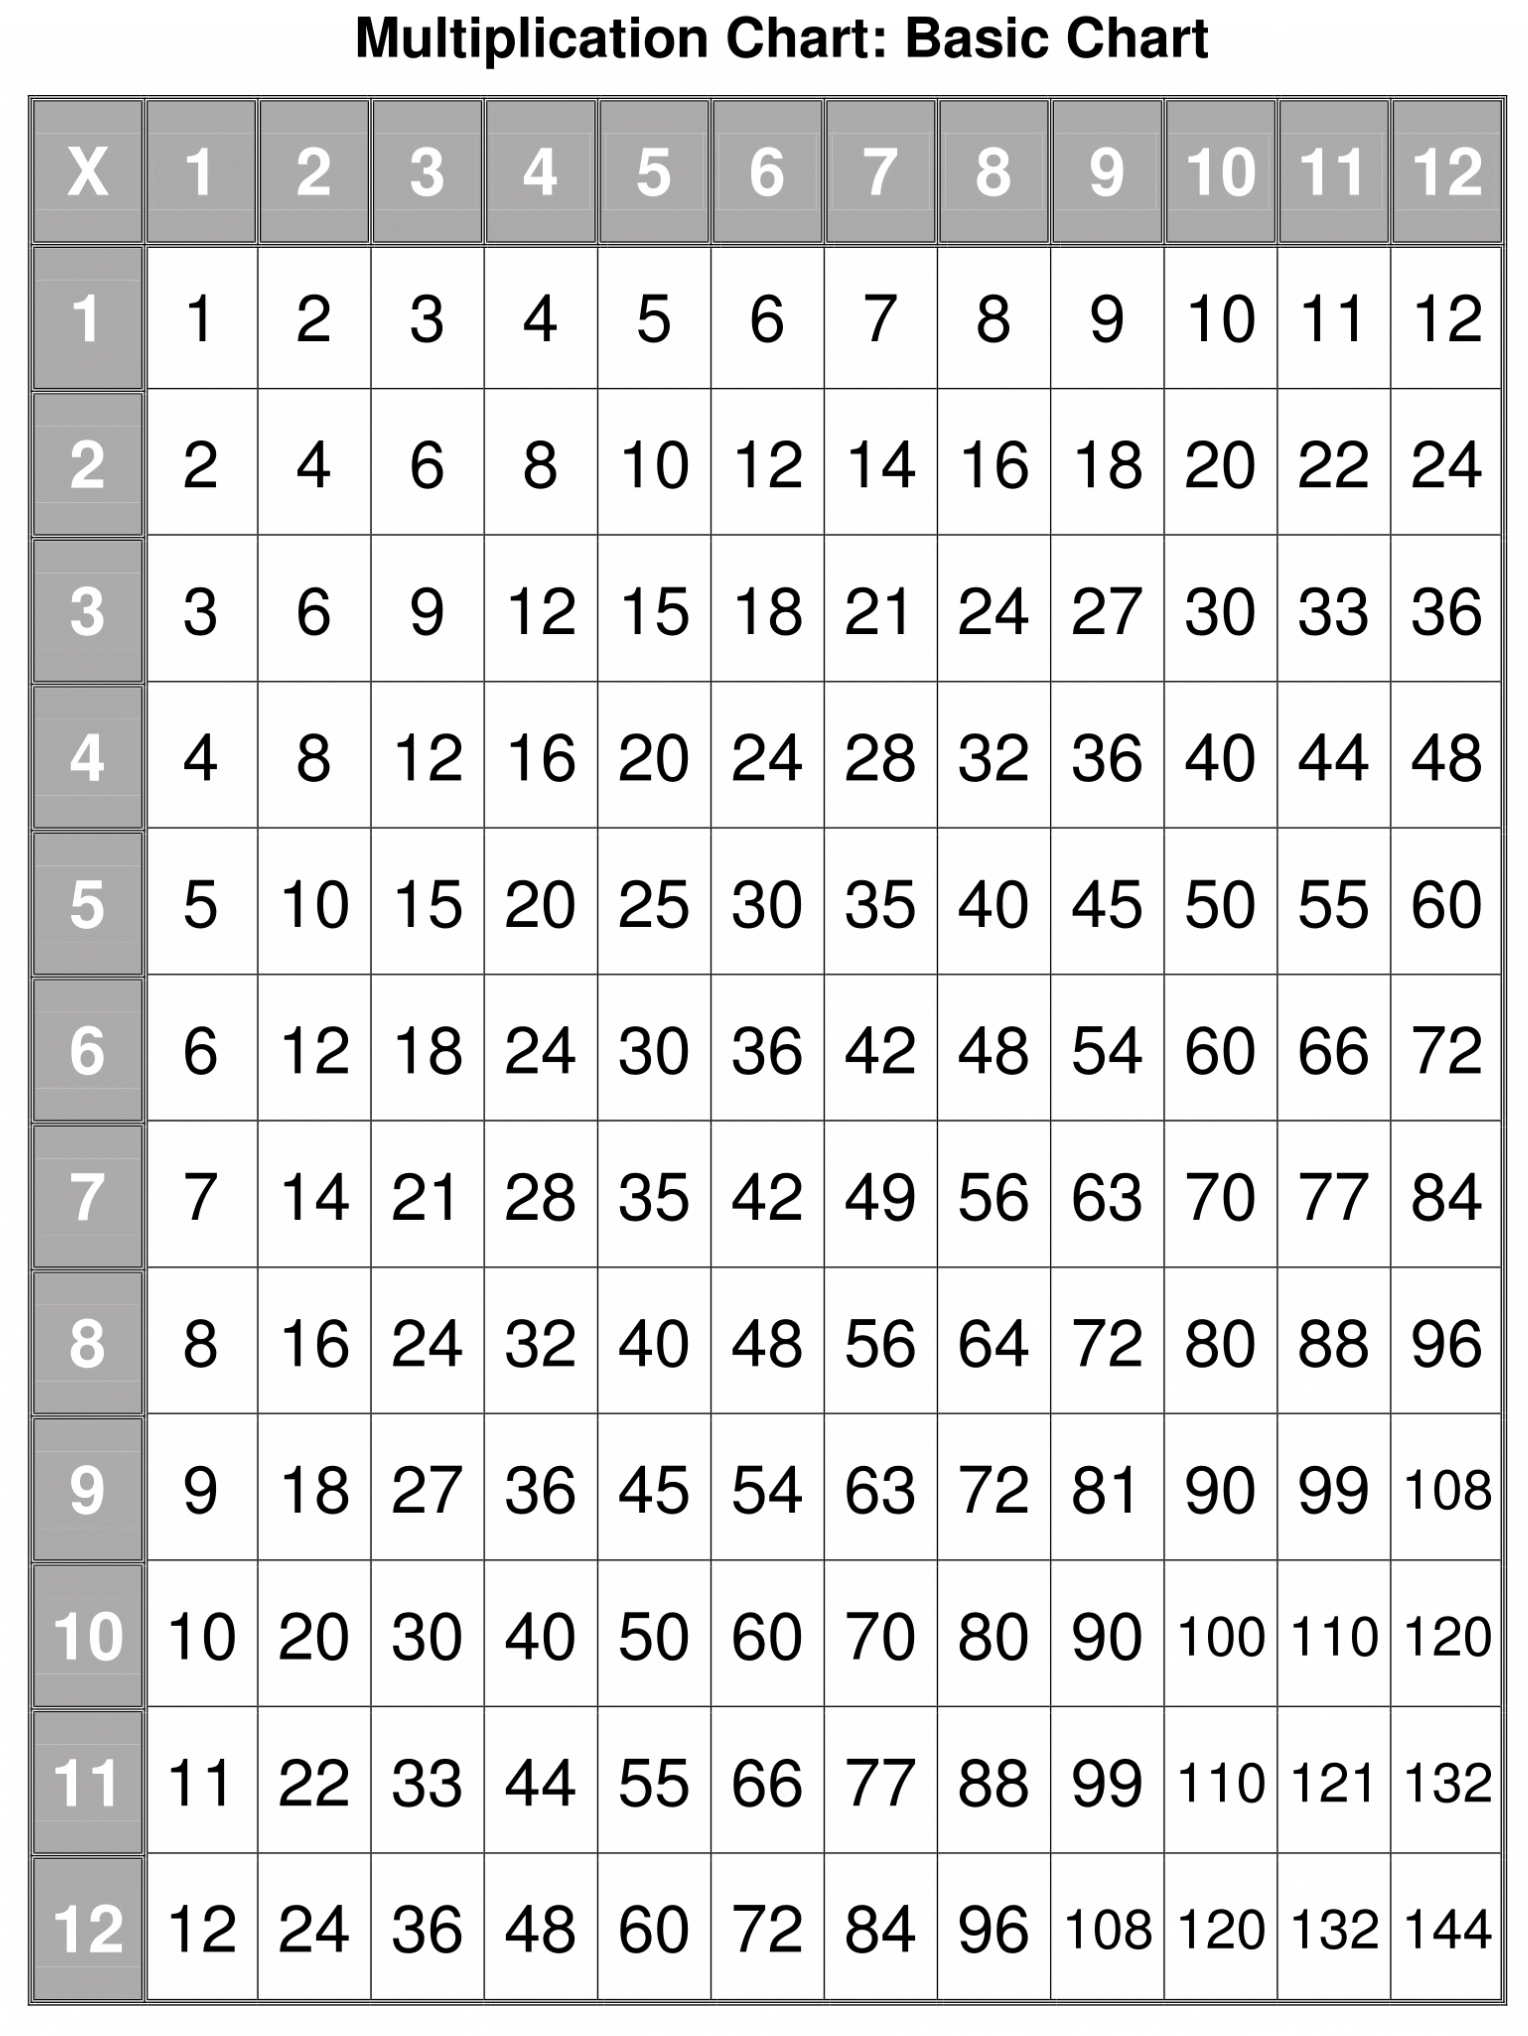 Printable Multiplication Table Pdf | Multiplication Charts regarding Printable Multiplication Chart To 12